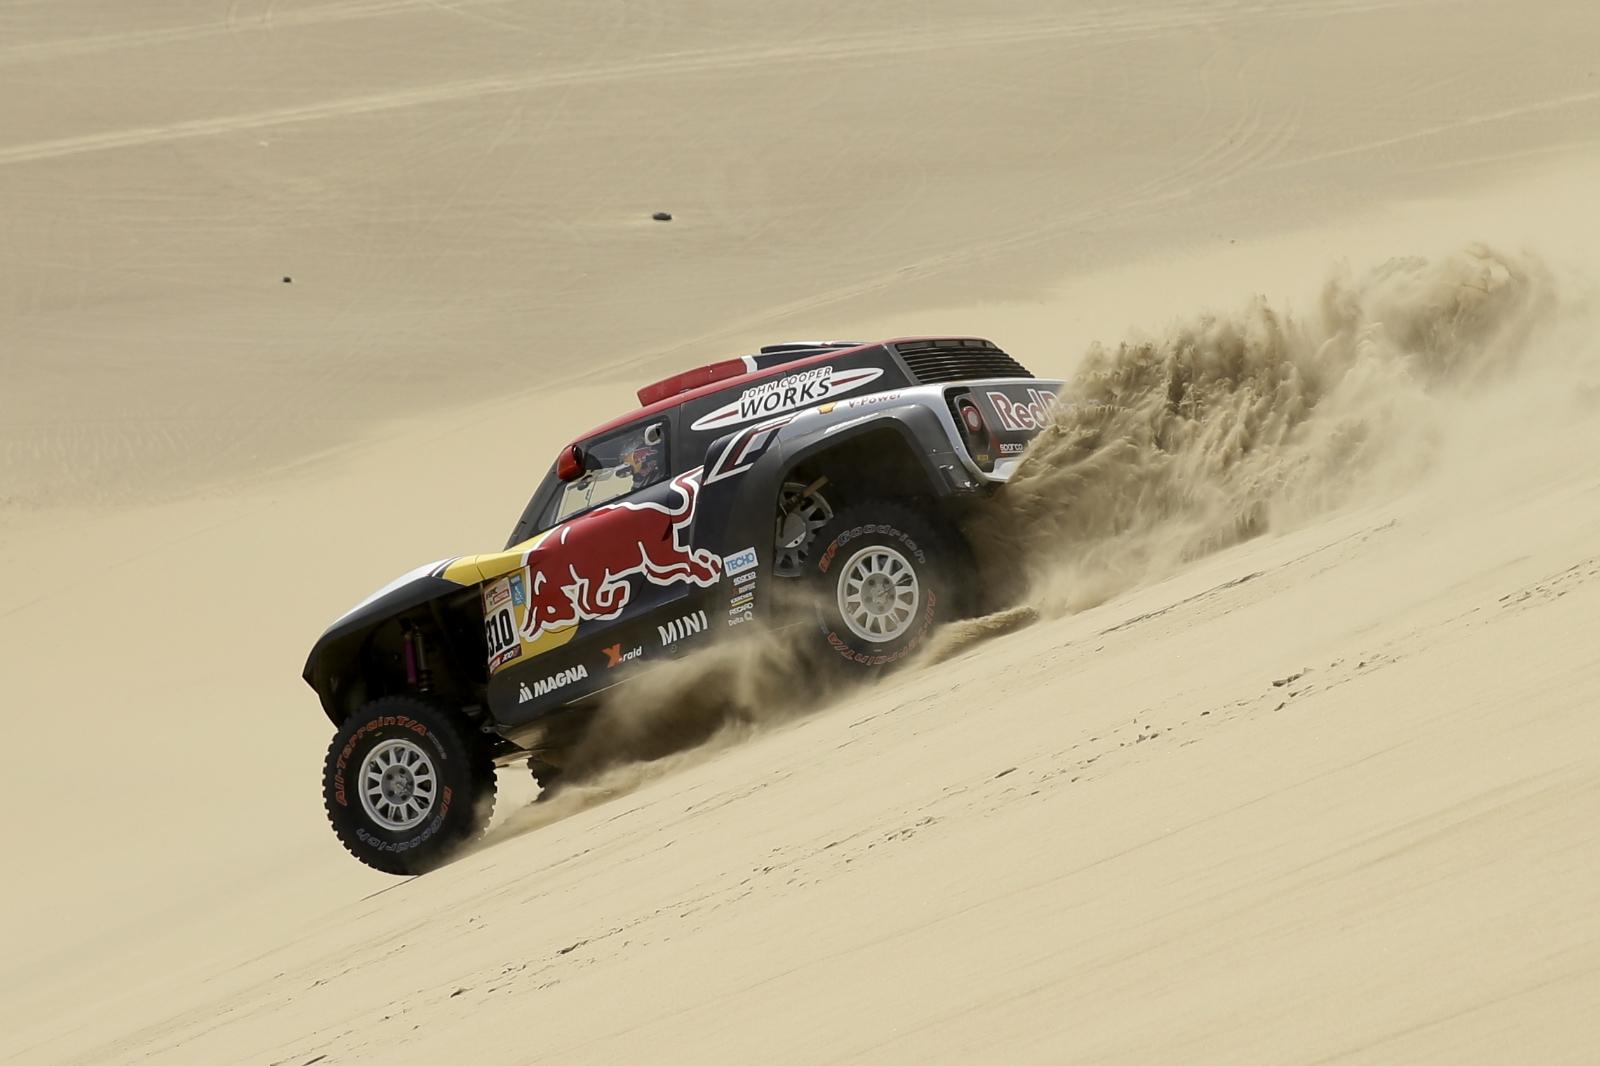 Rally Dakar 2018: Auto de Bryce Menzies queda destrozado en accidente [FOTOS]